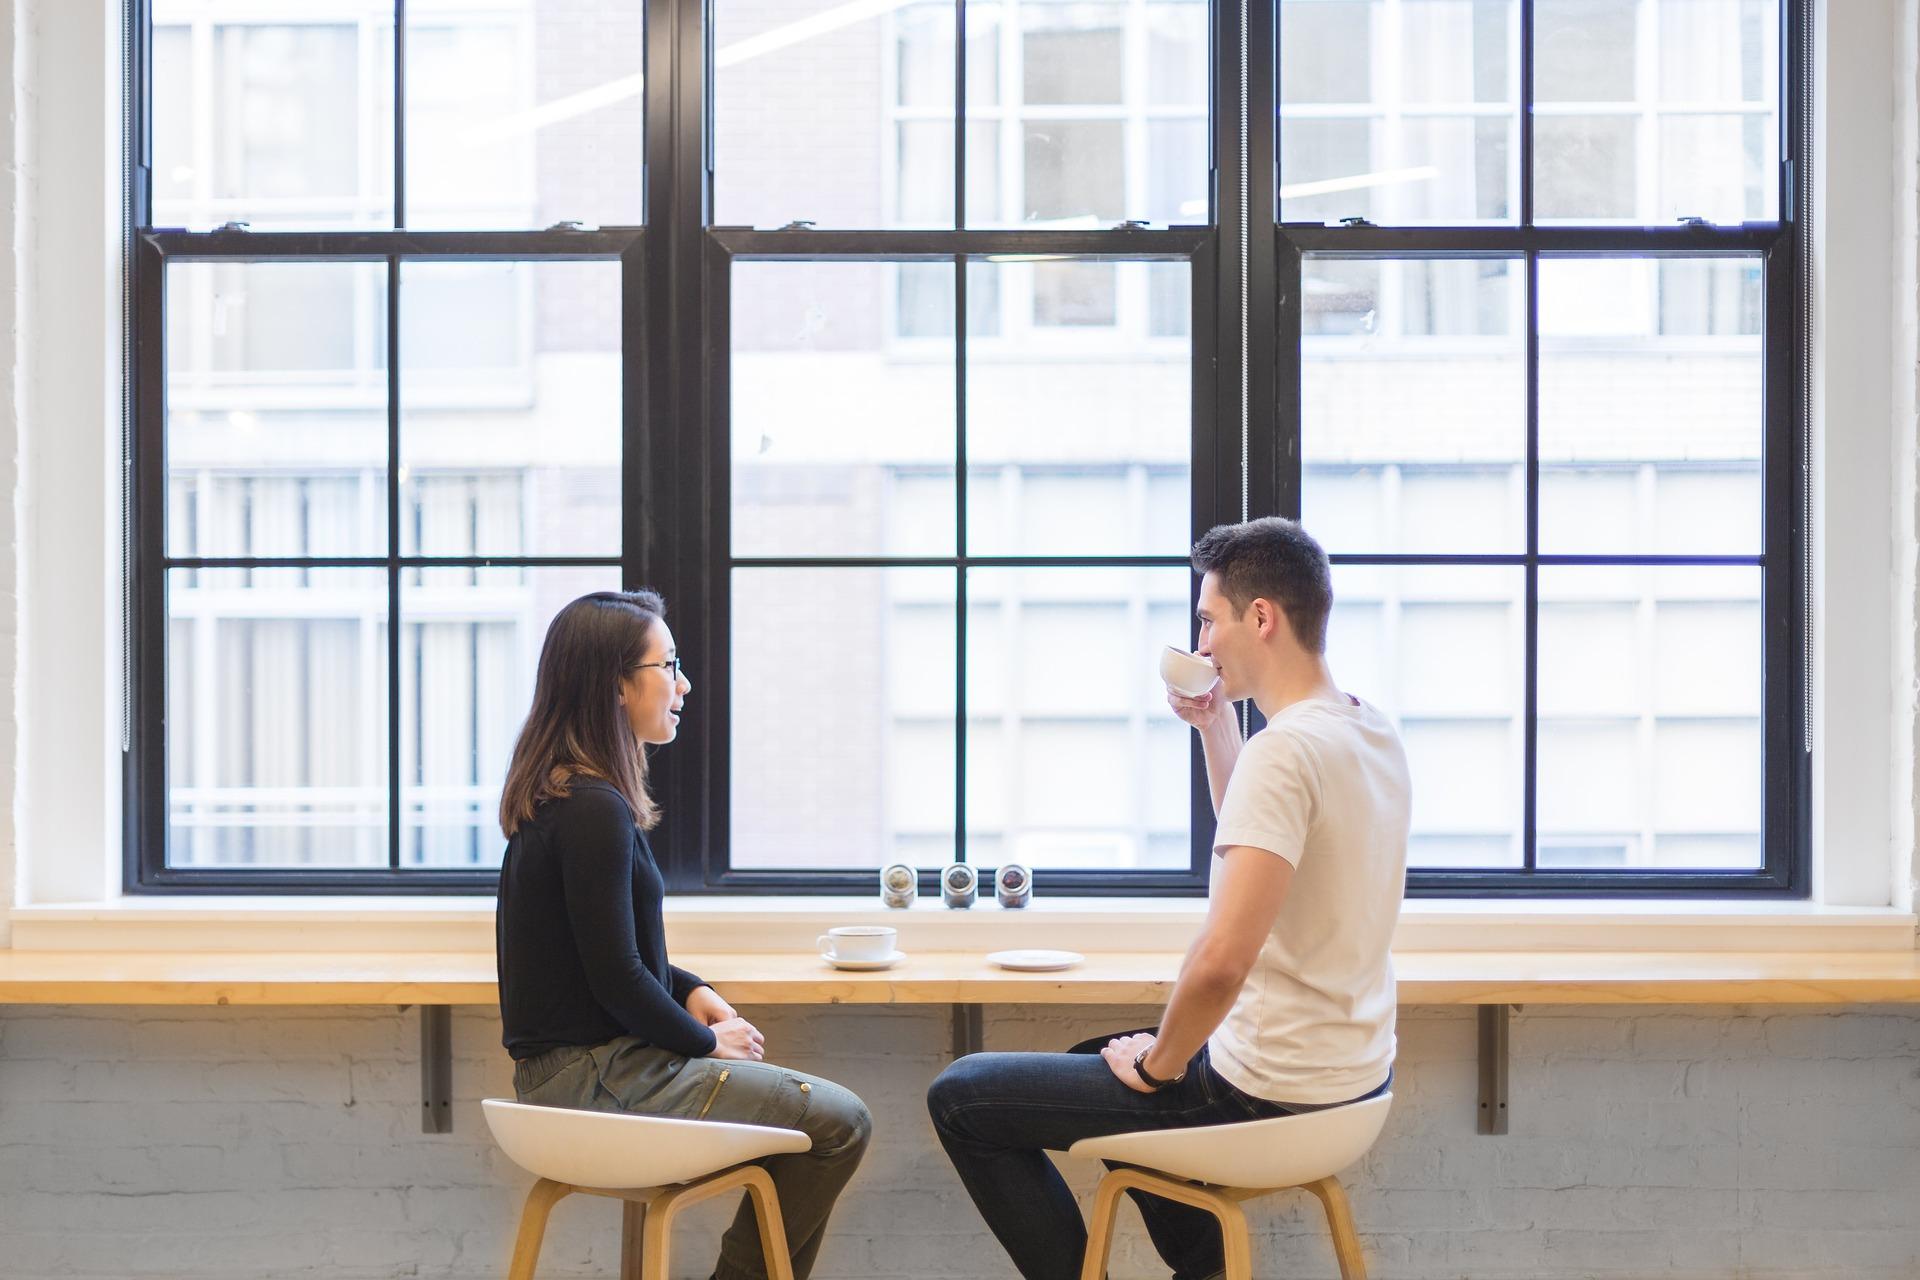 Tips for Japanese Job Interviews